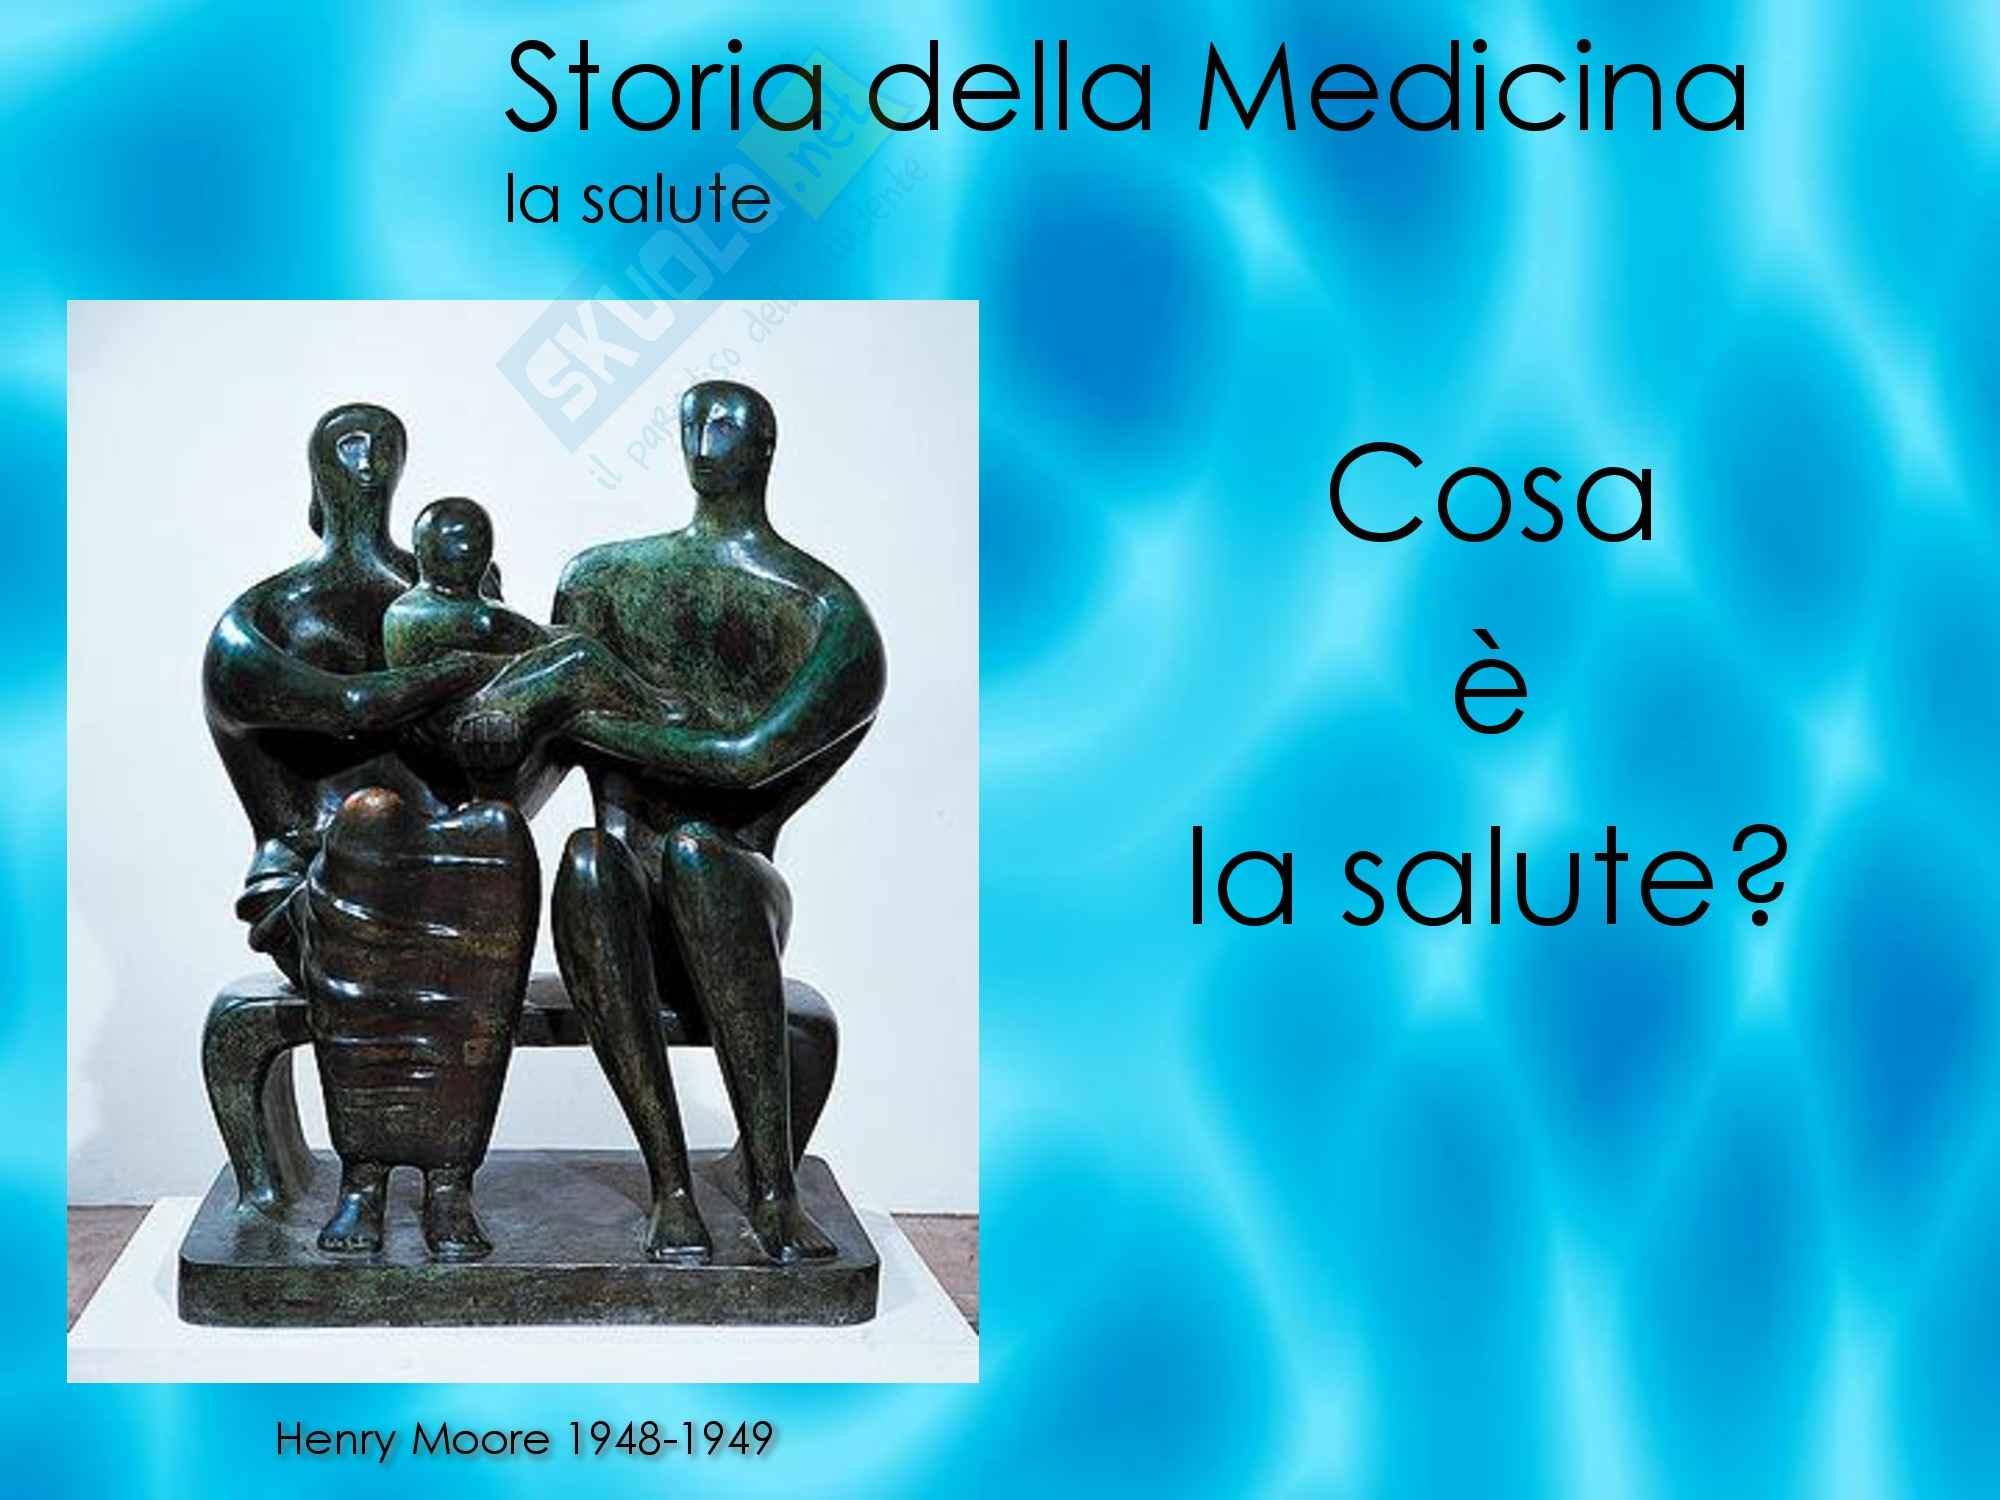 Storia della medicina - La salute Pag. 2